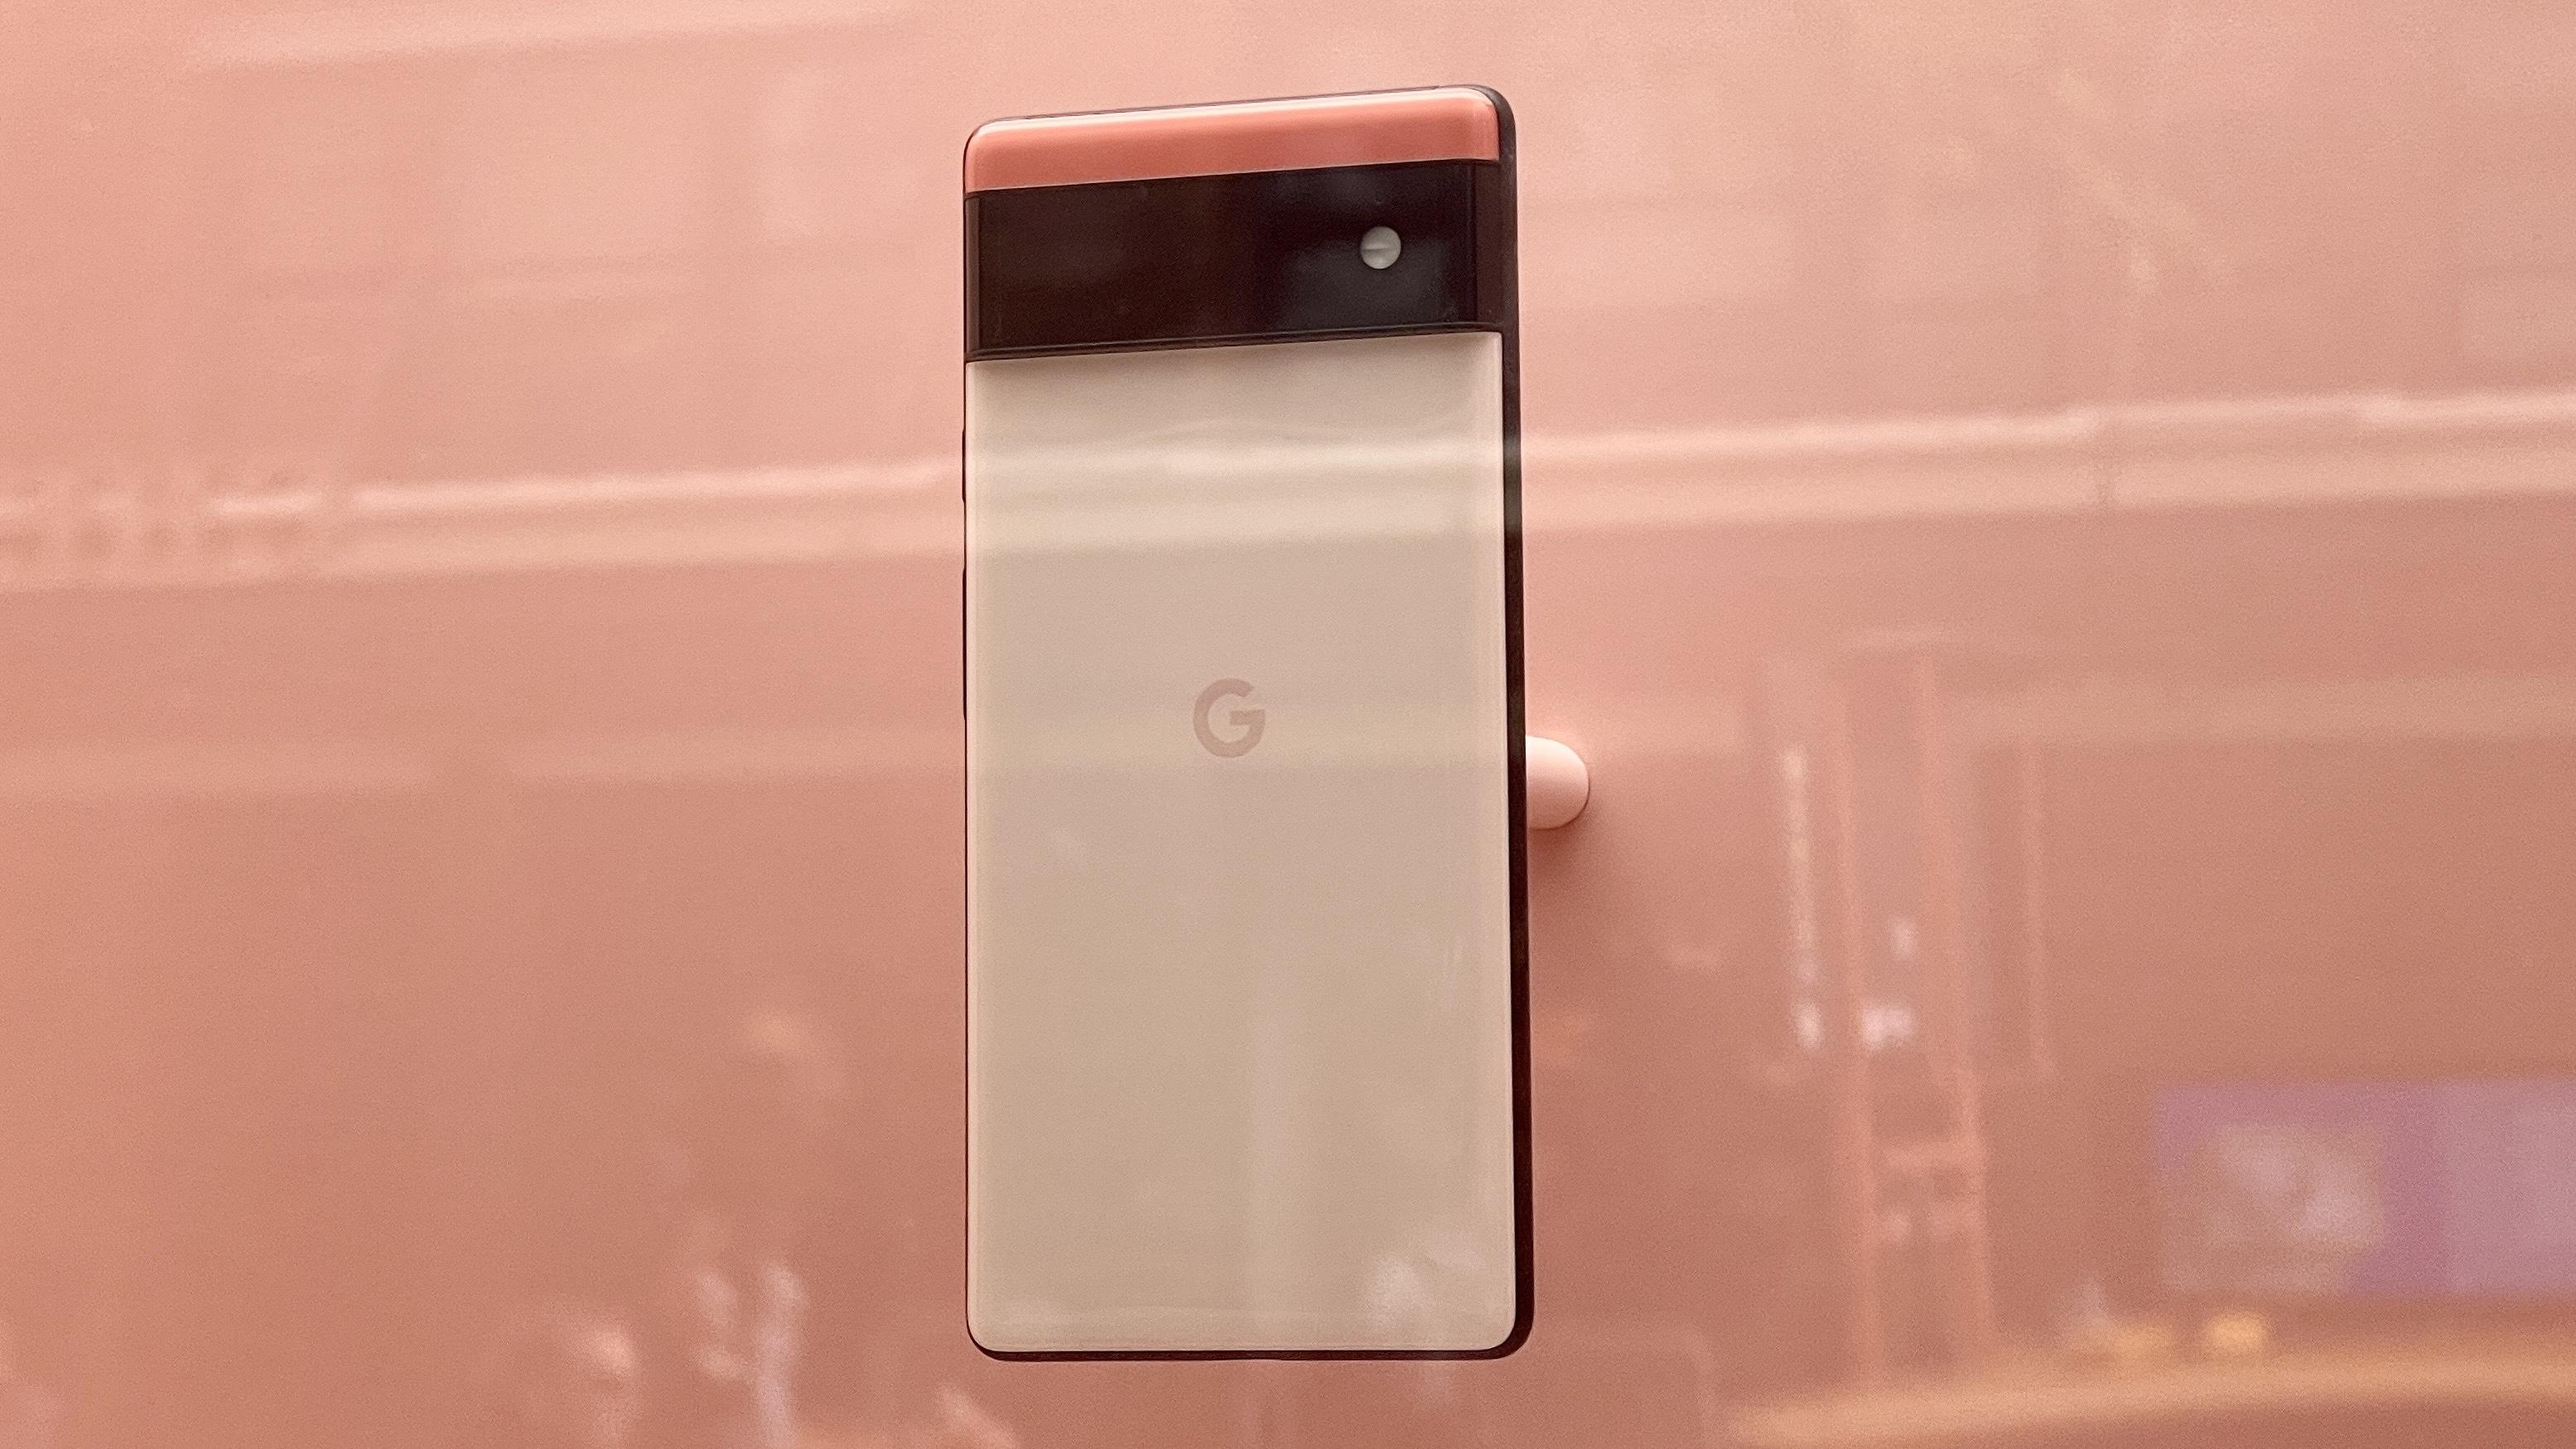 Google Pixel 6 on display in NYC Google store